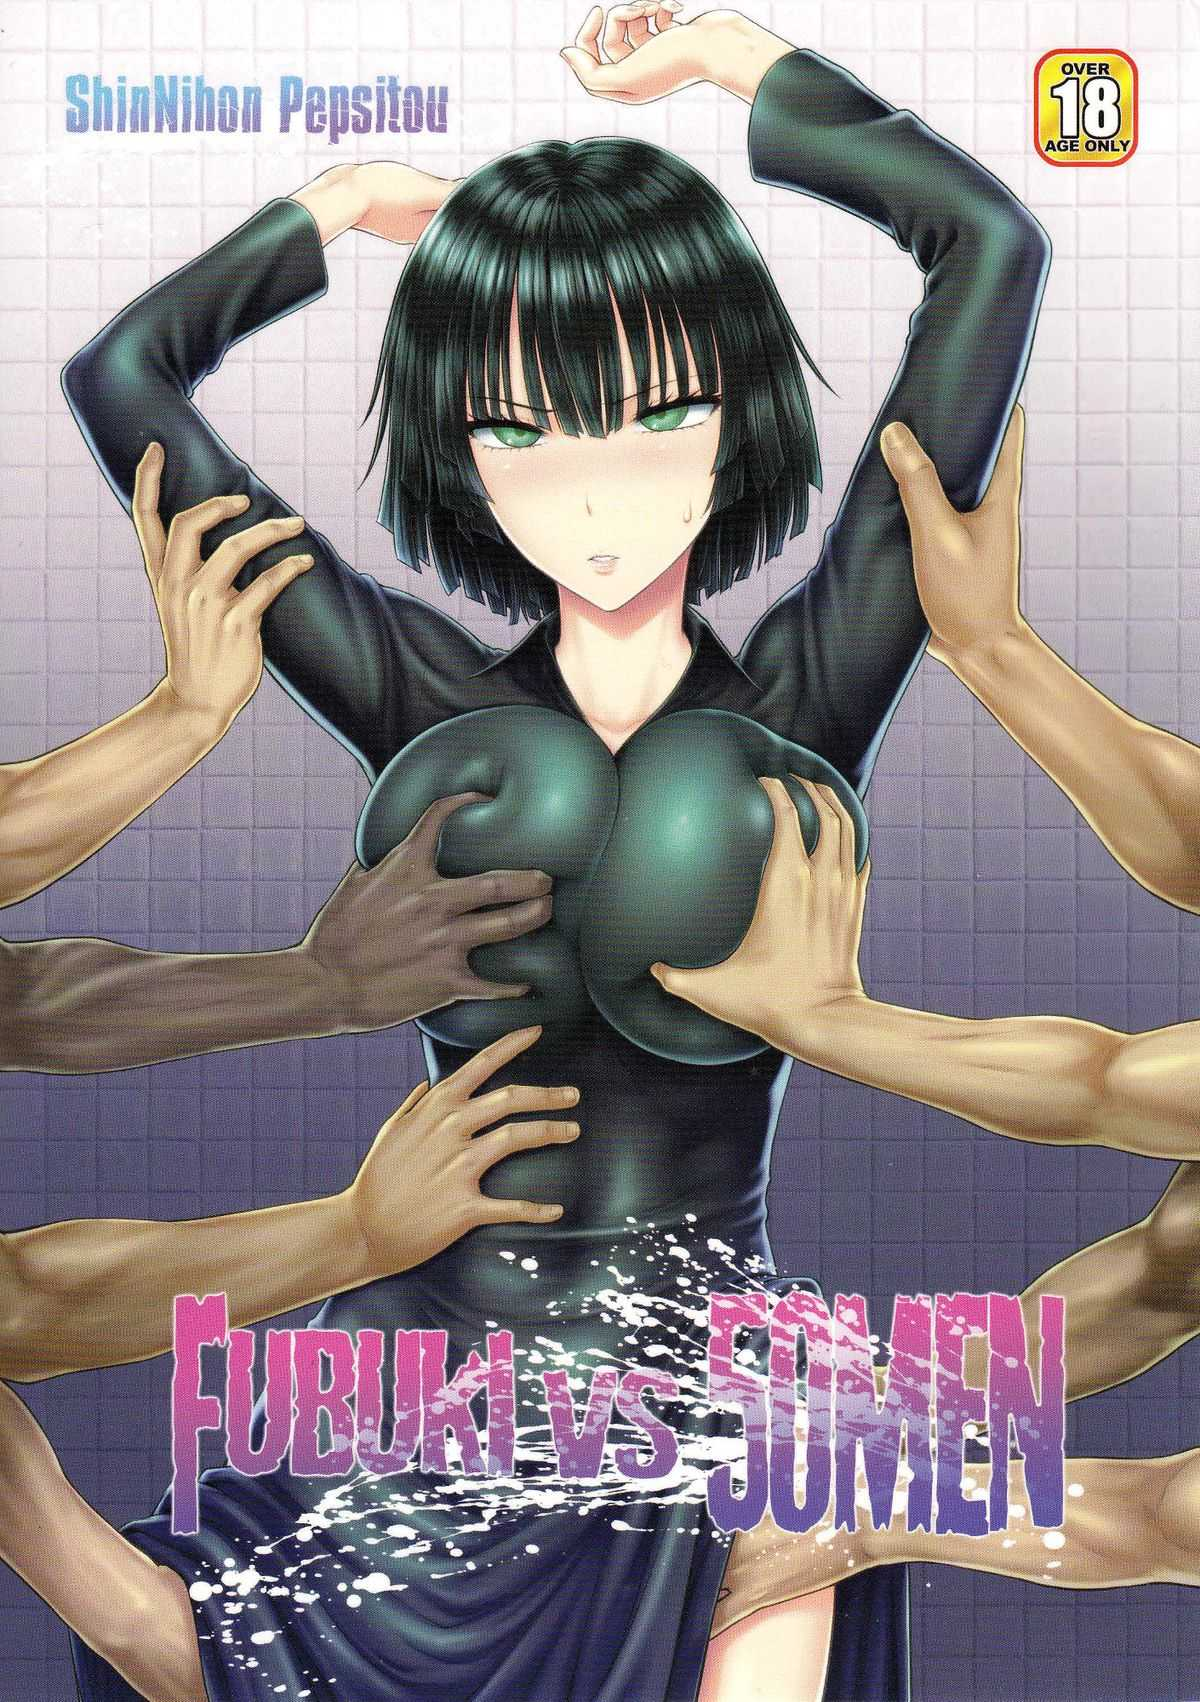 c89-shinnihon-pepsitou-stgermain-sal-fubuki-vs-50men-one-punch-man